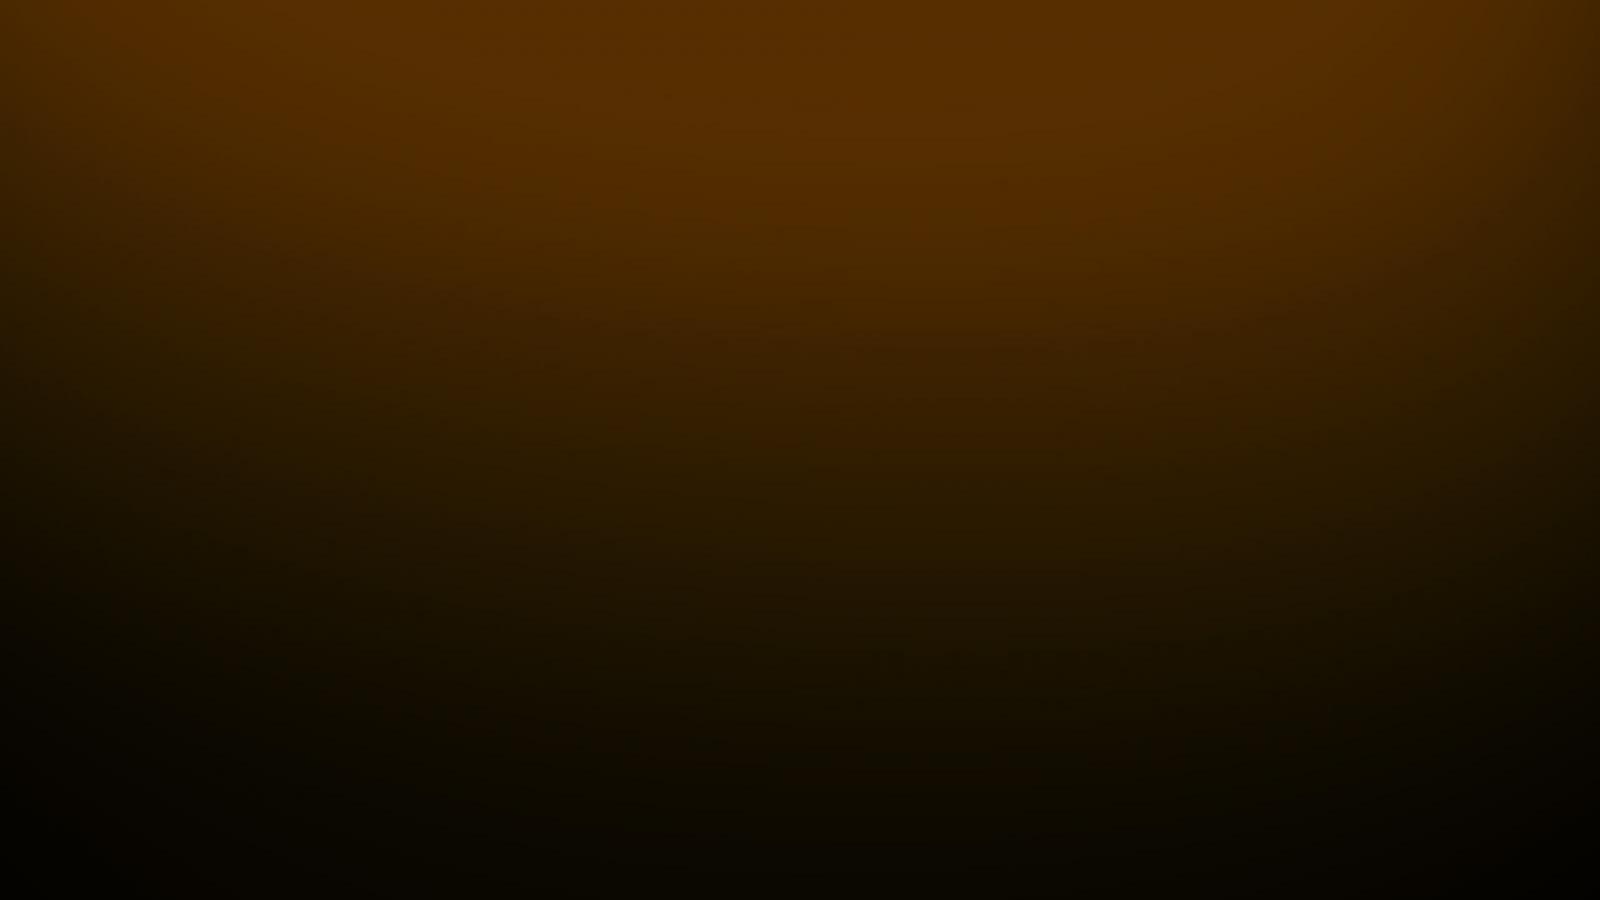 1600x900 Brown Wallpapers Windows Wallpaper Brown Windows 7 1600x900